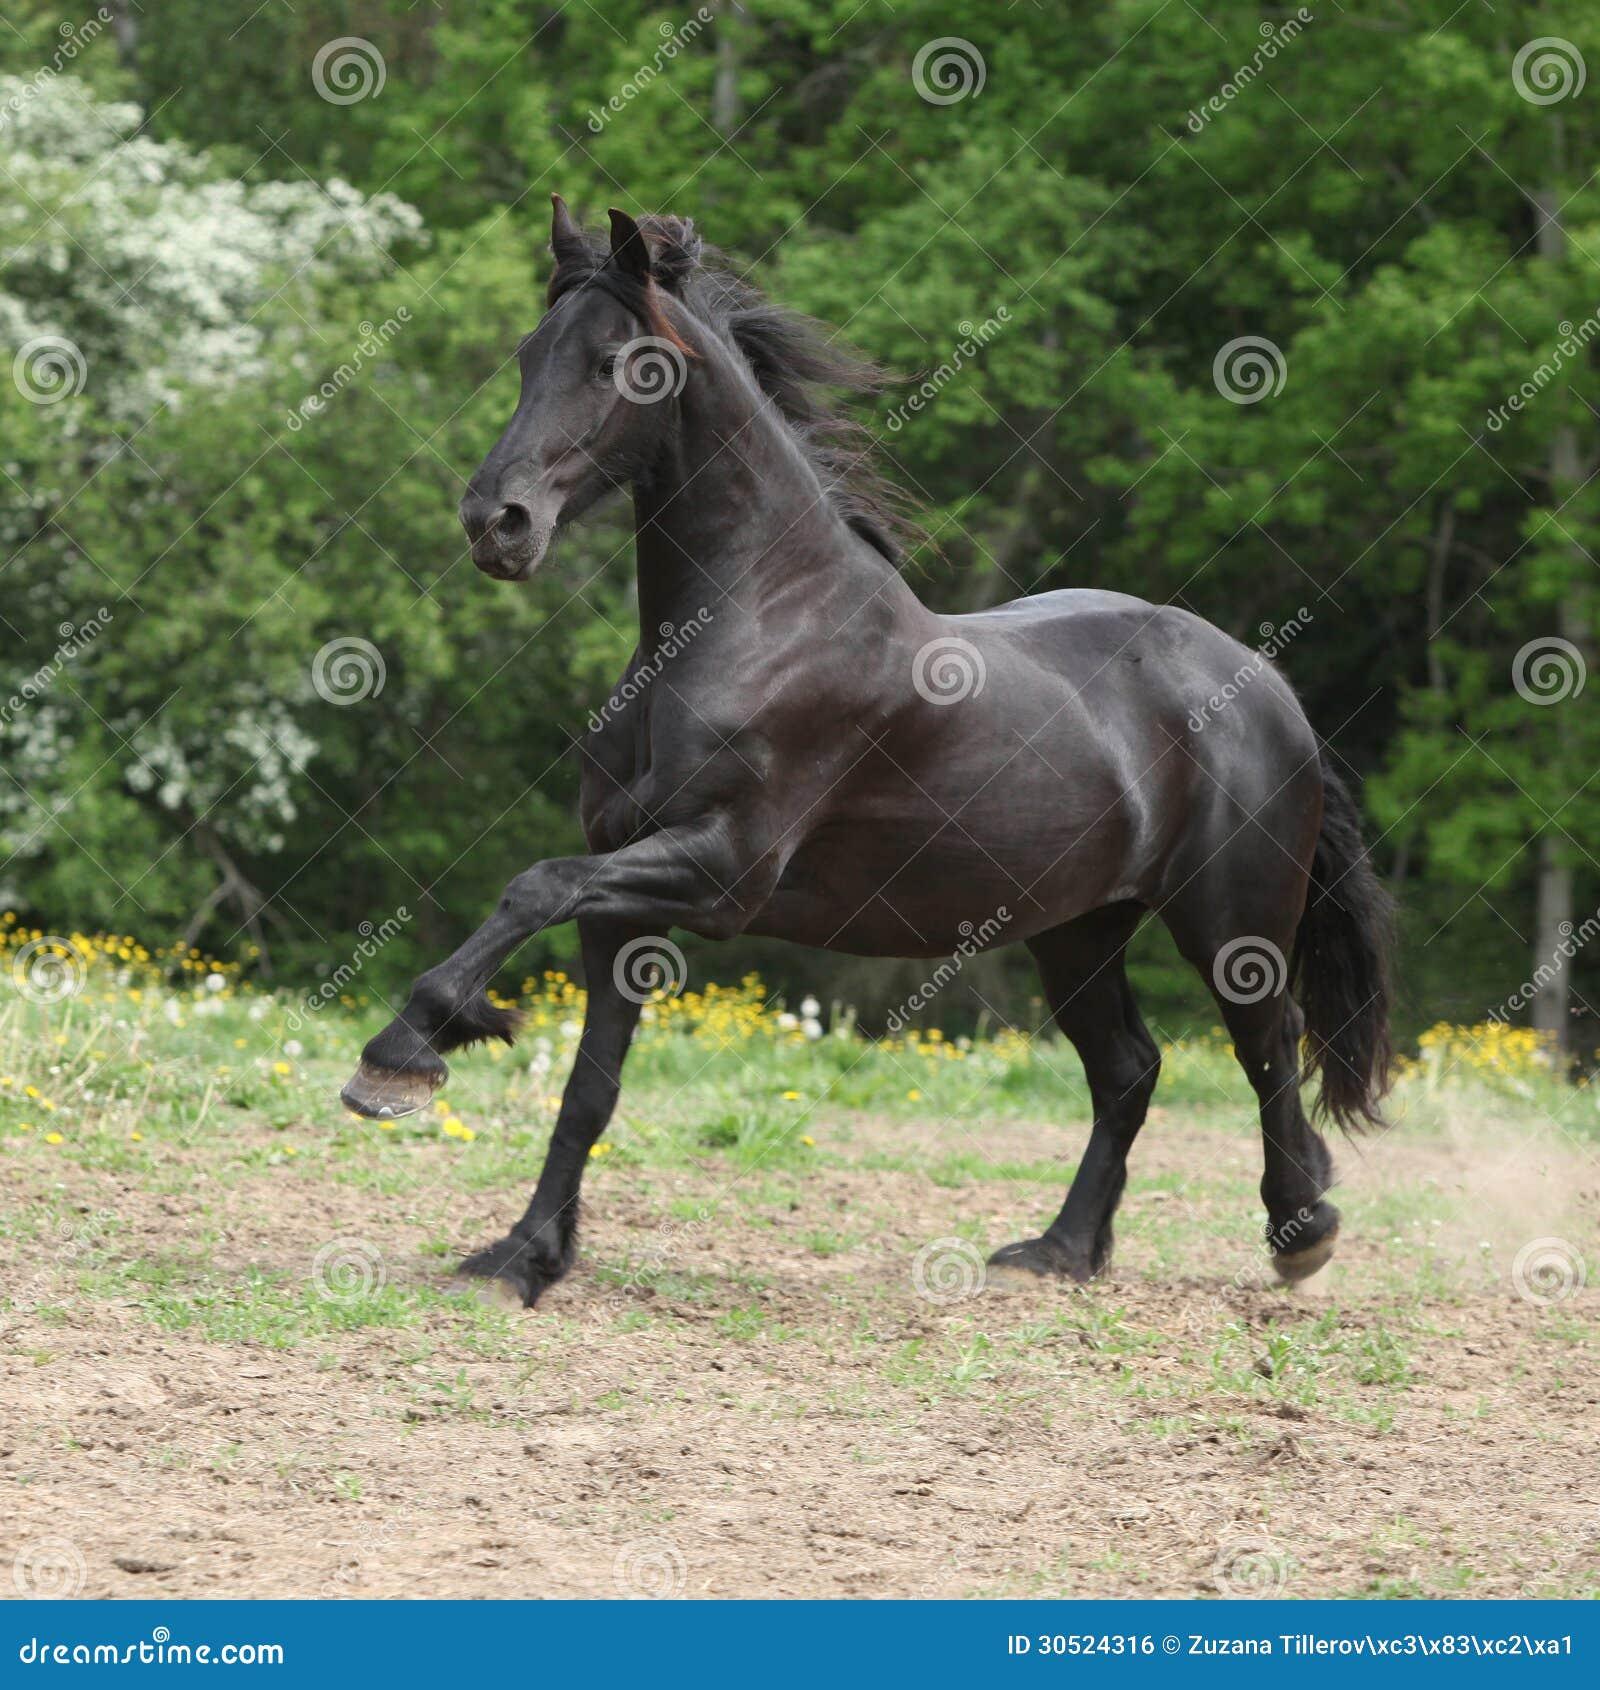 Black Horse Wallpapers - Wallpaper Cave  |Friesian Horses Running